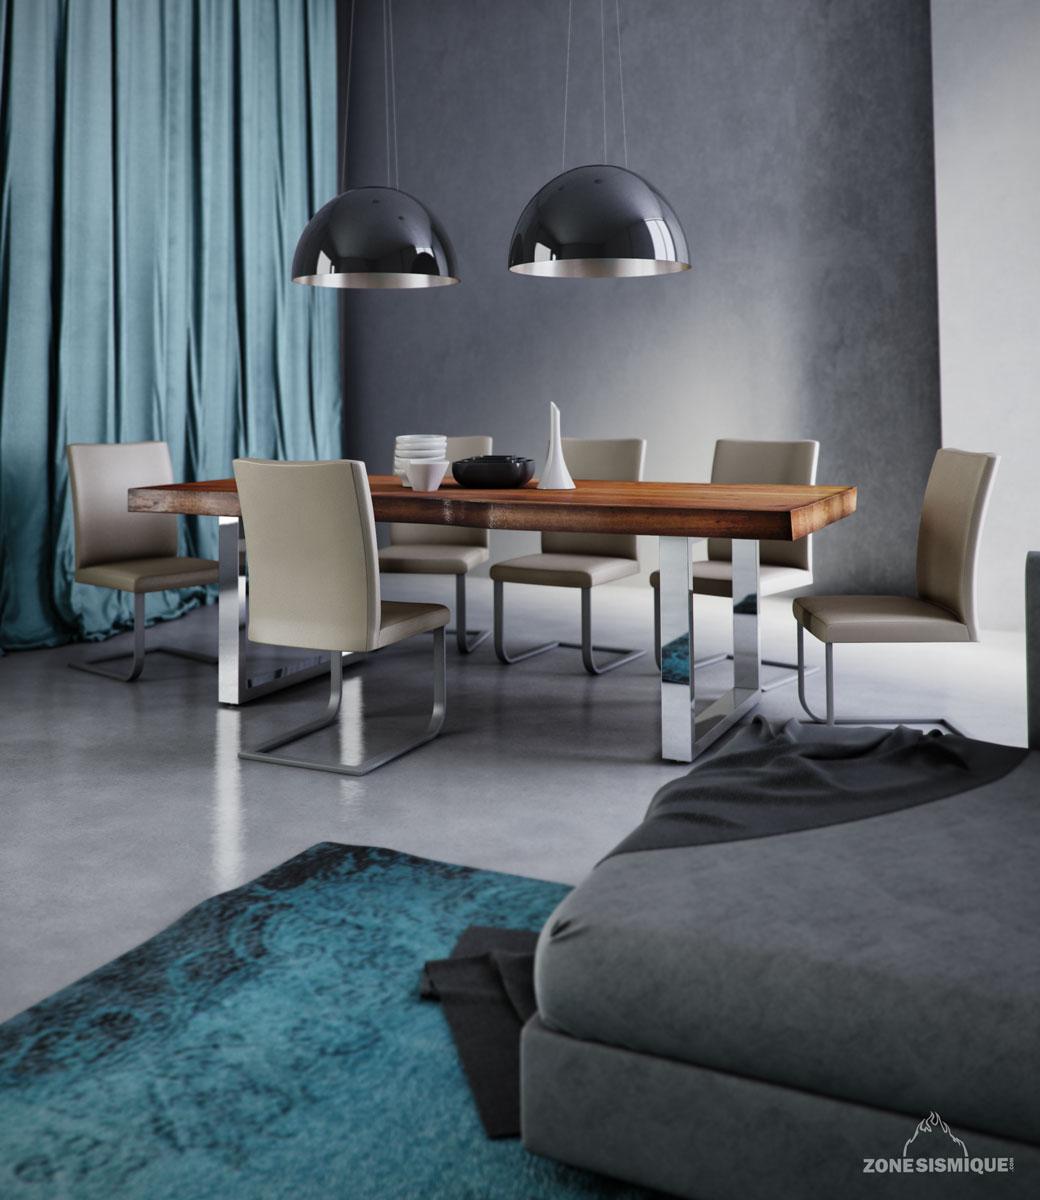 Zone sismique colibri lifestyle salle a manger tom 3d v1 for Salle a manger 3d